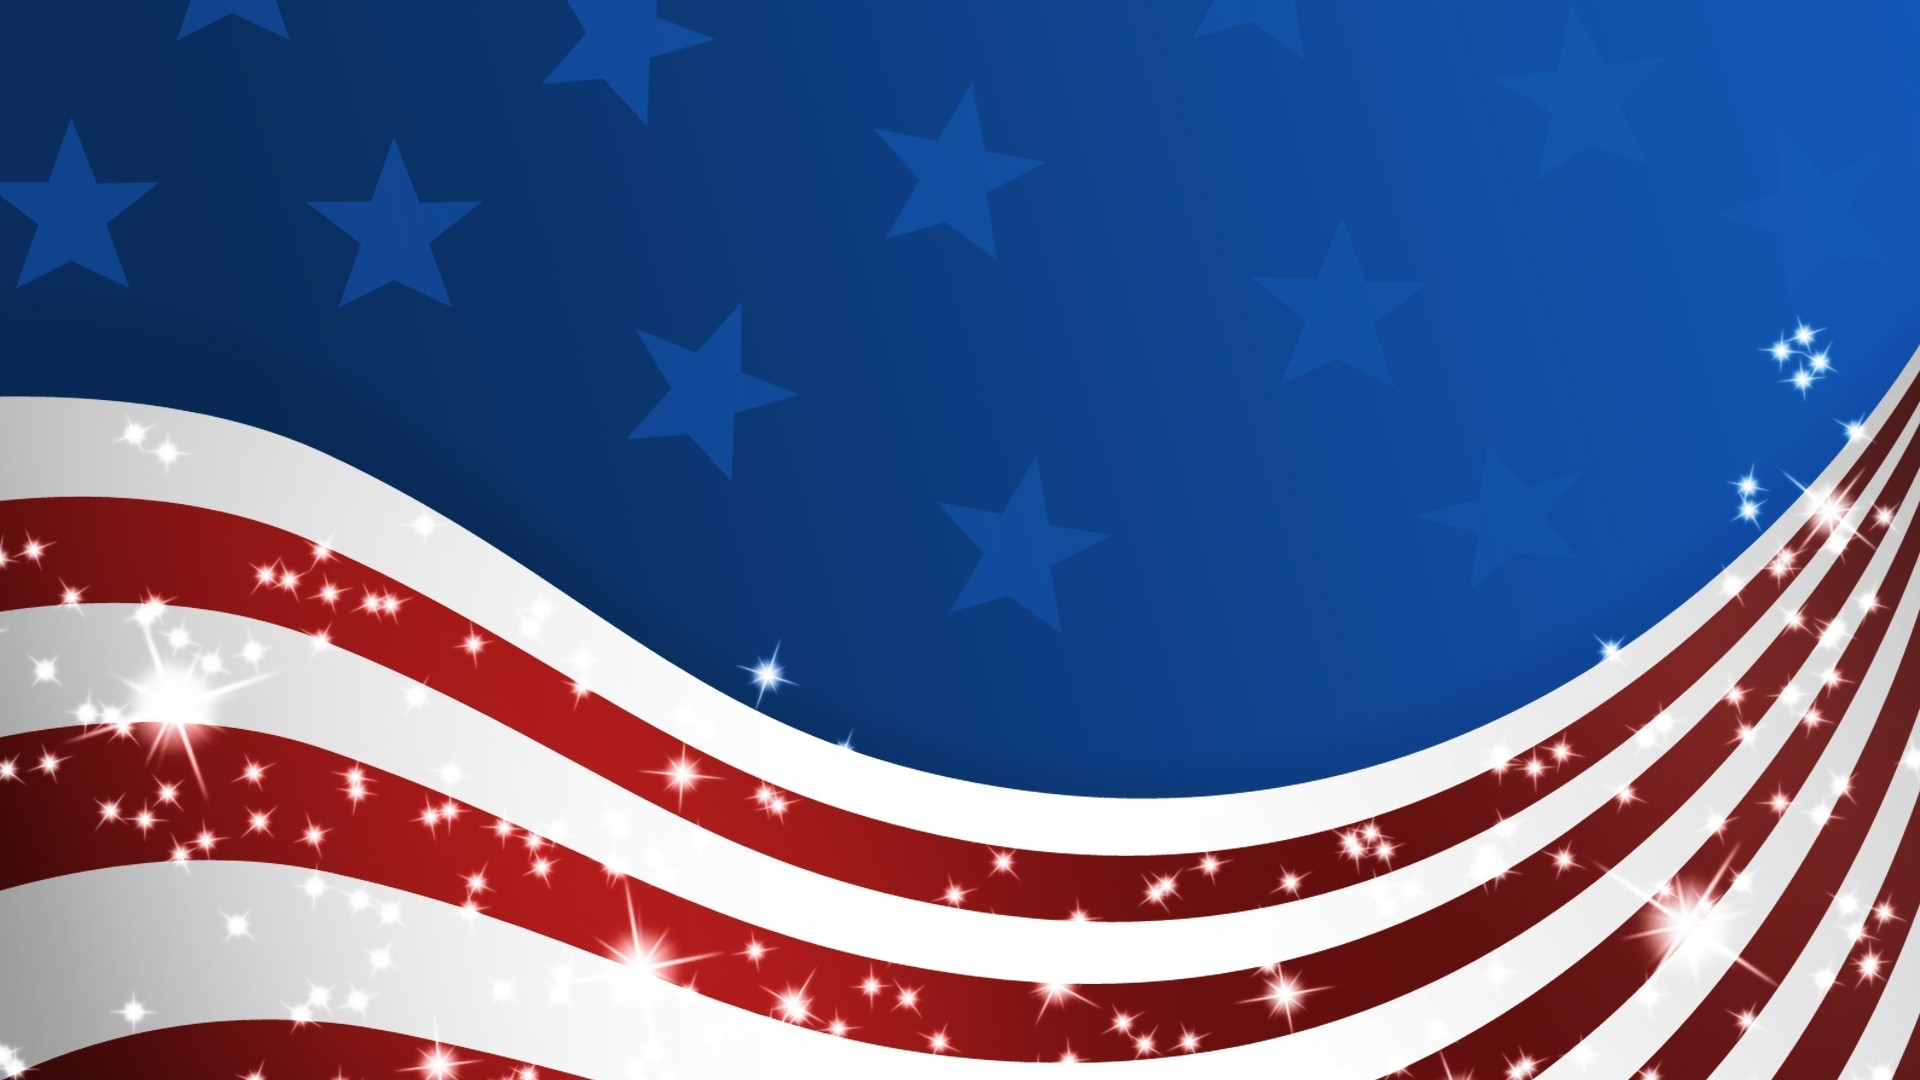 american 3d renders patriotic flag of america stars and stripes